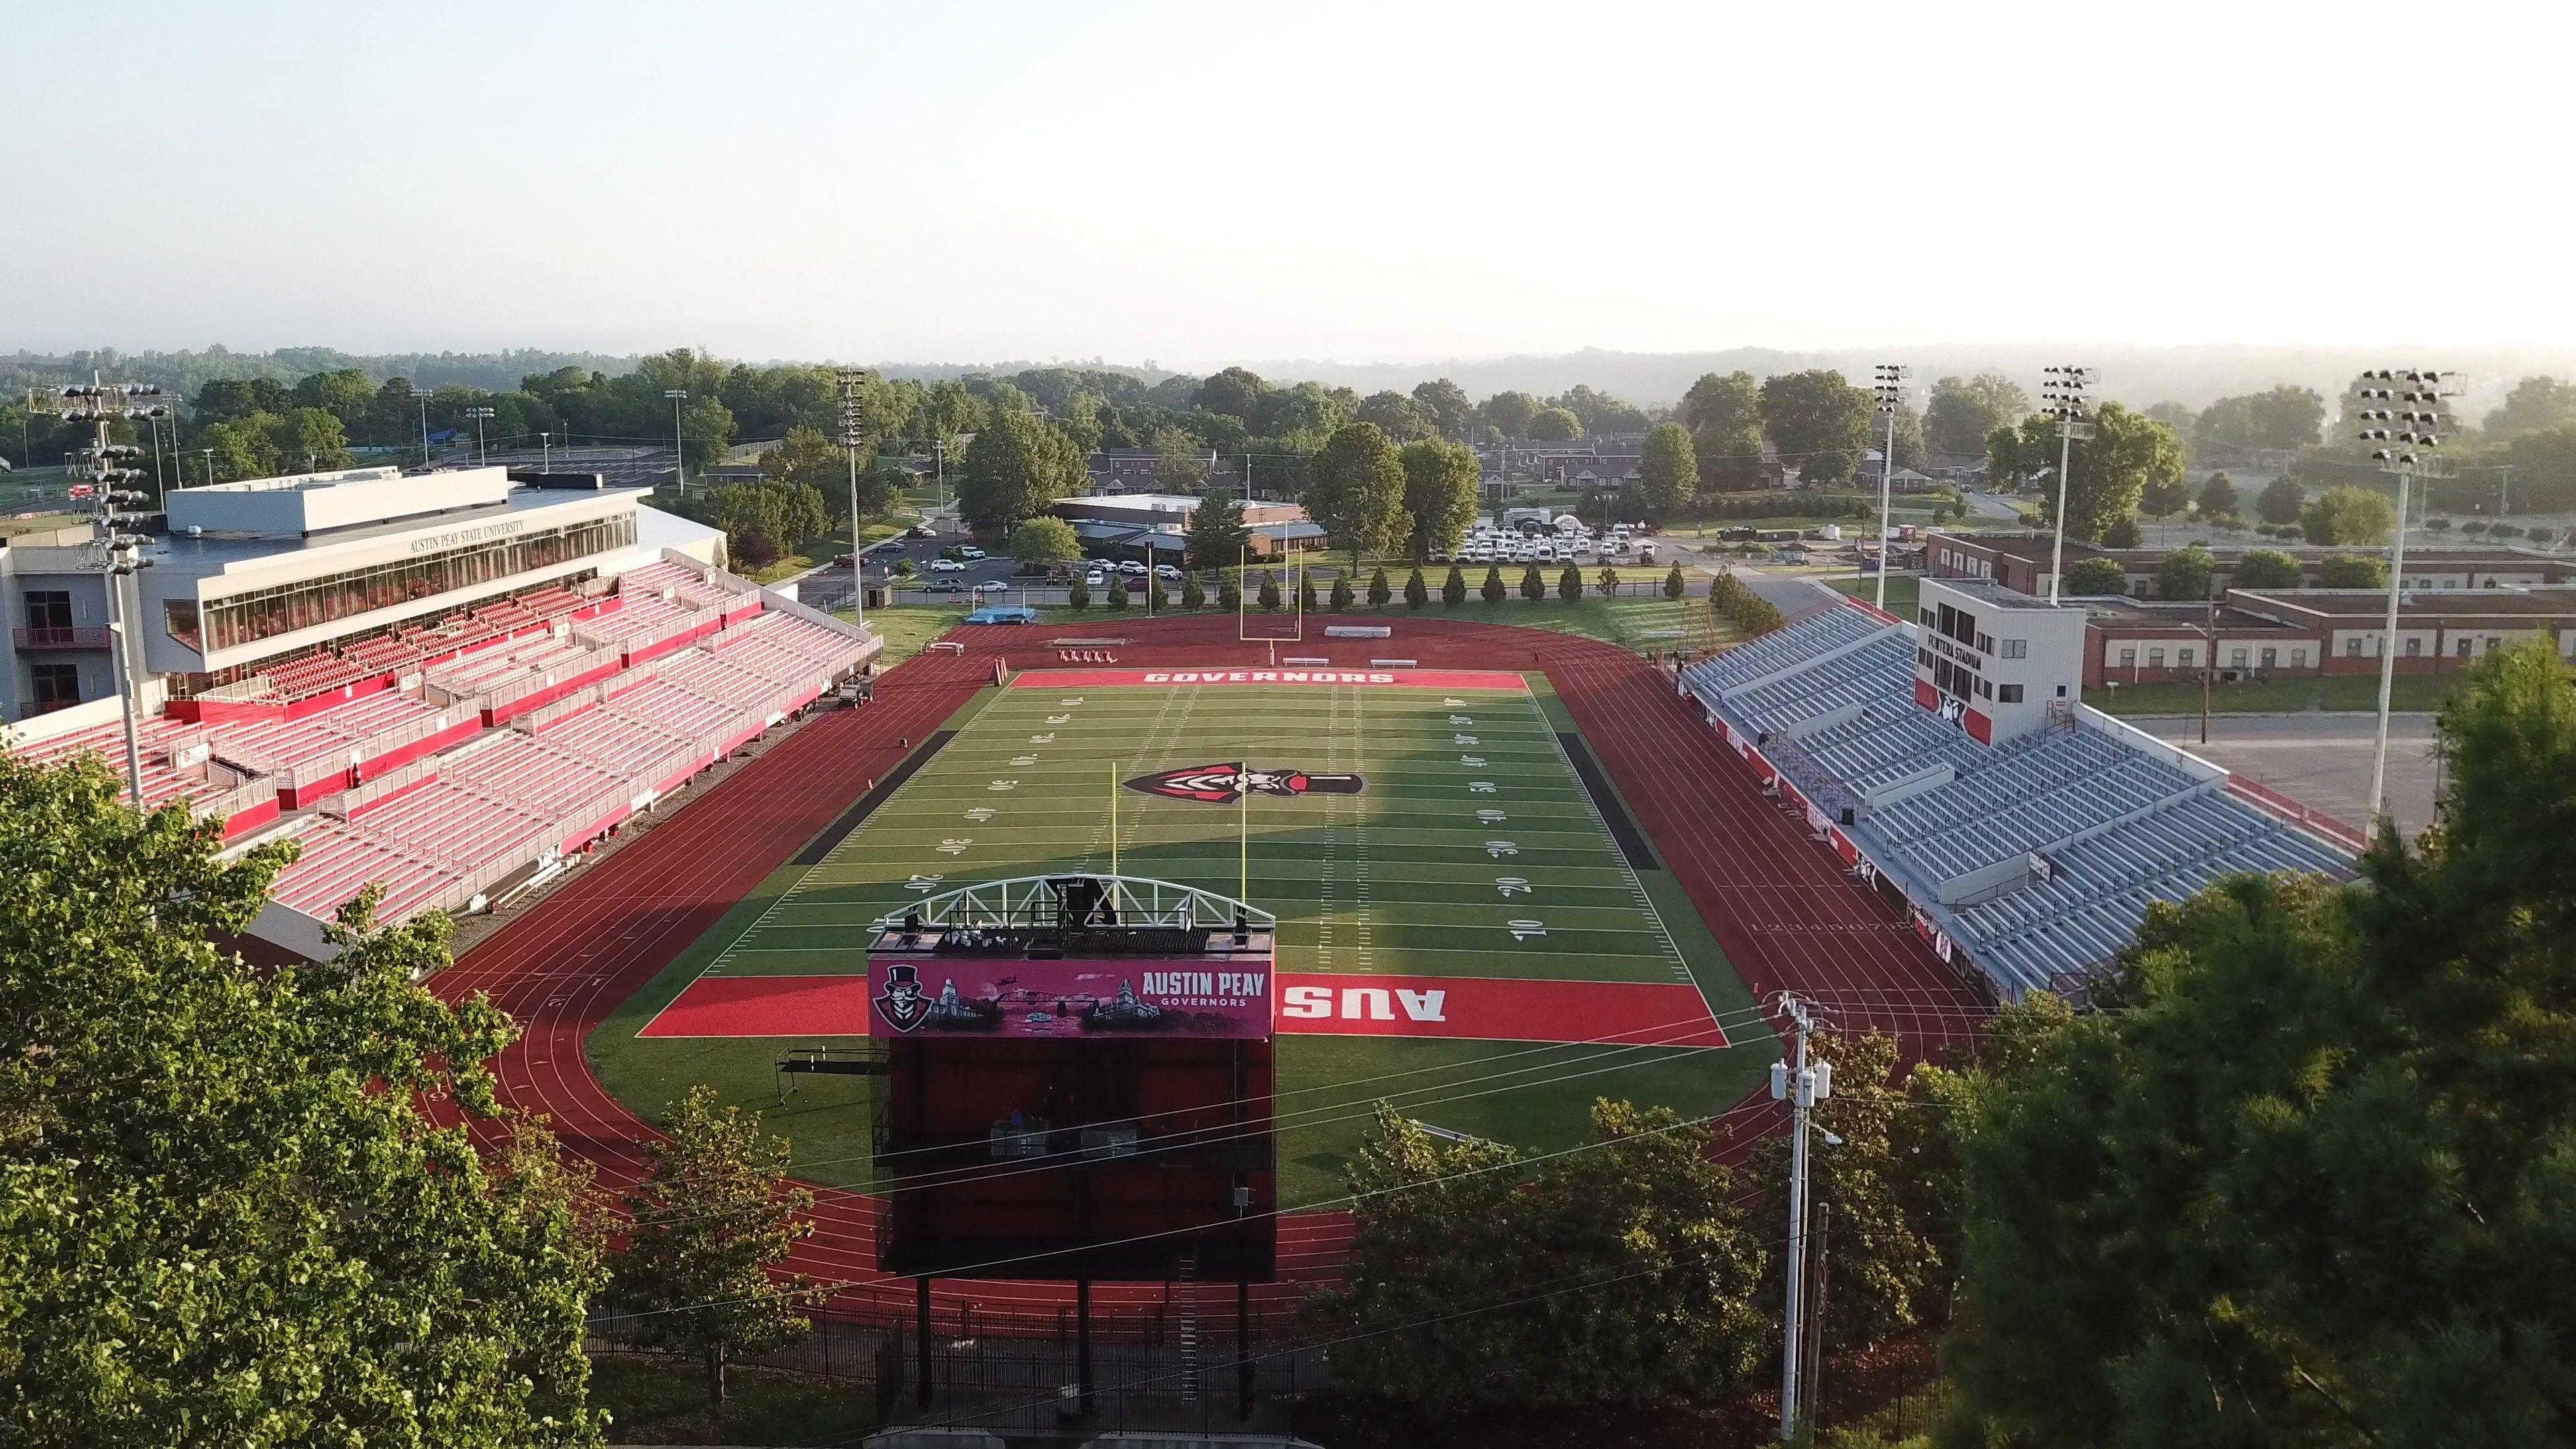 Austin peay state university football field 4k drone